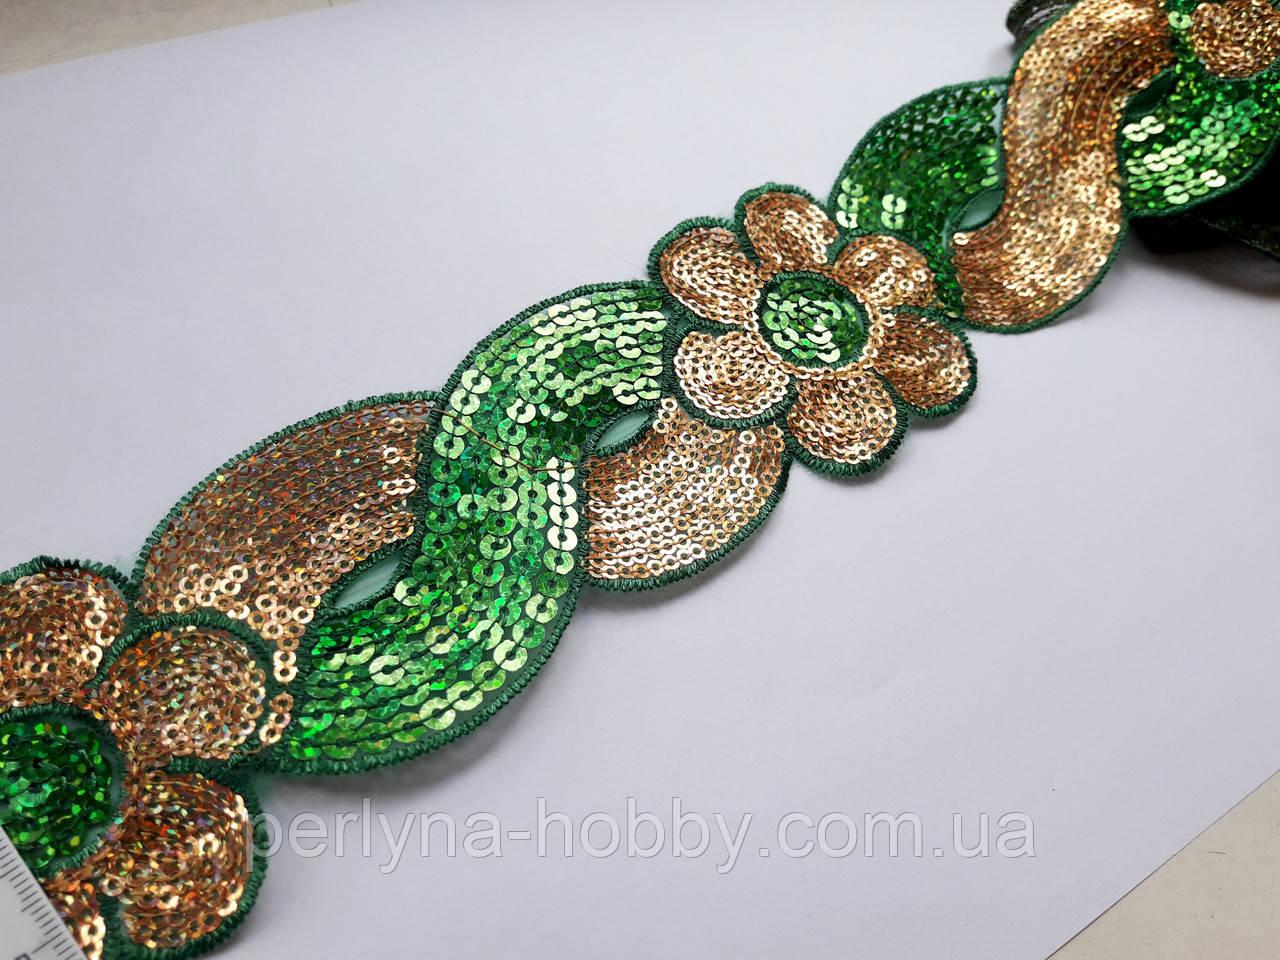 Тесьма з паєтками вишита зелена зі золотом 5,5 см Тесьма с пайетками